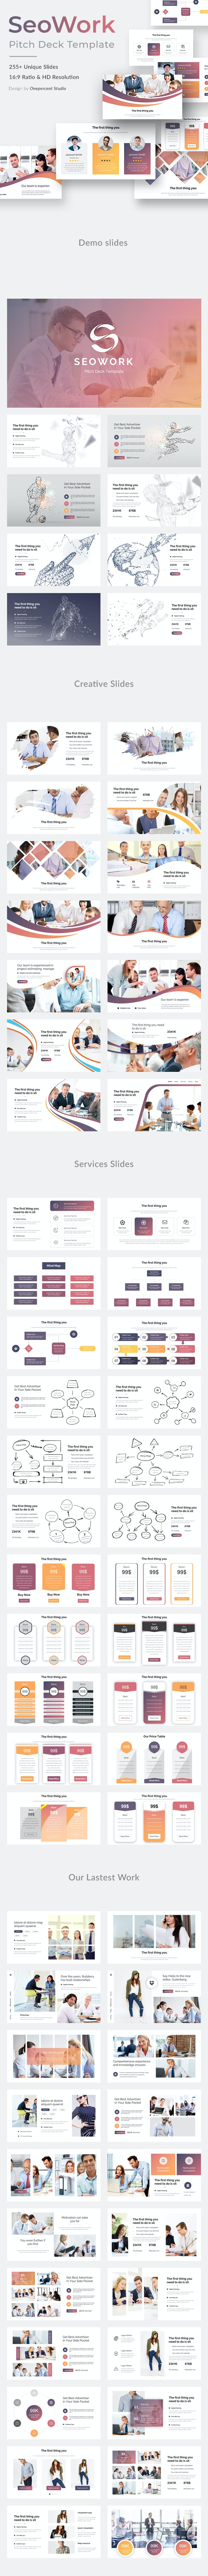 SeoWork Pitch Deck 2019 Keynote Template - Business Keynote Templates